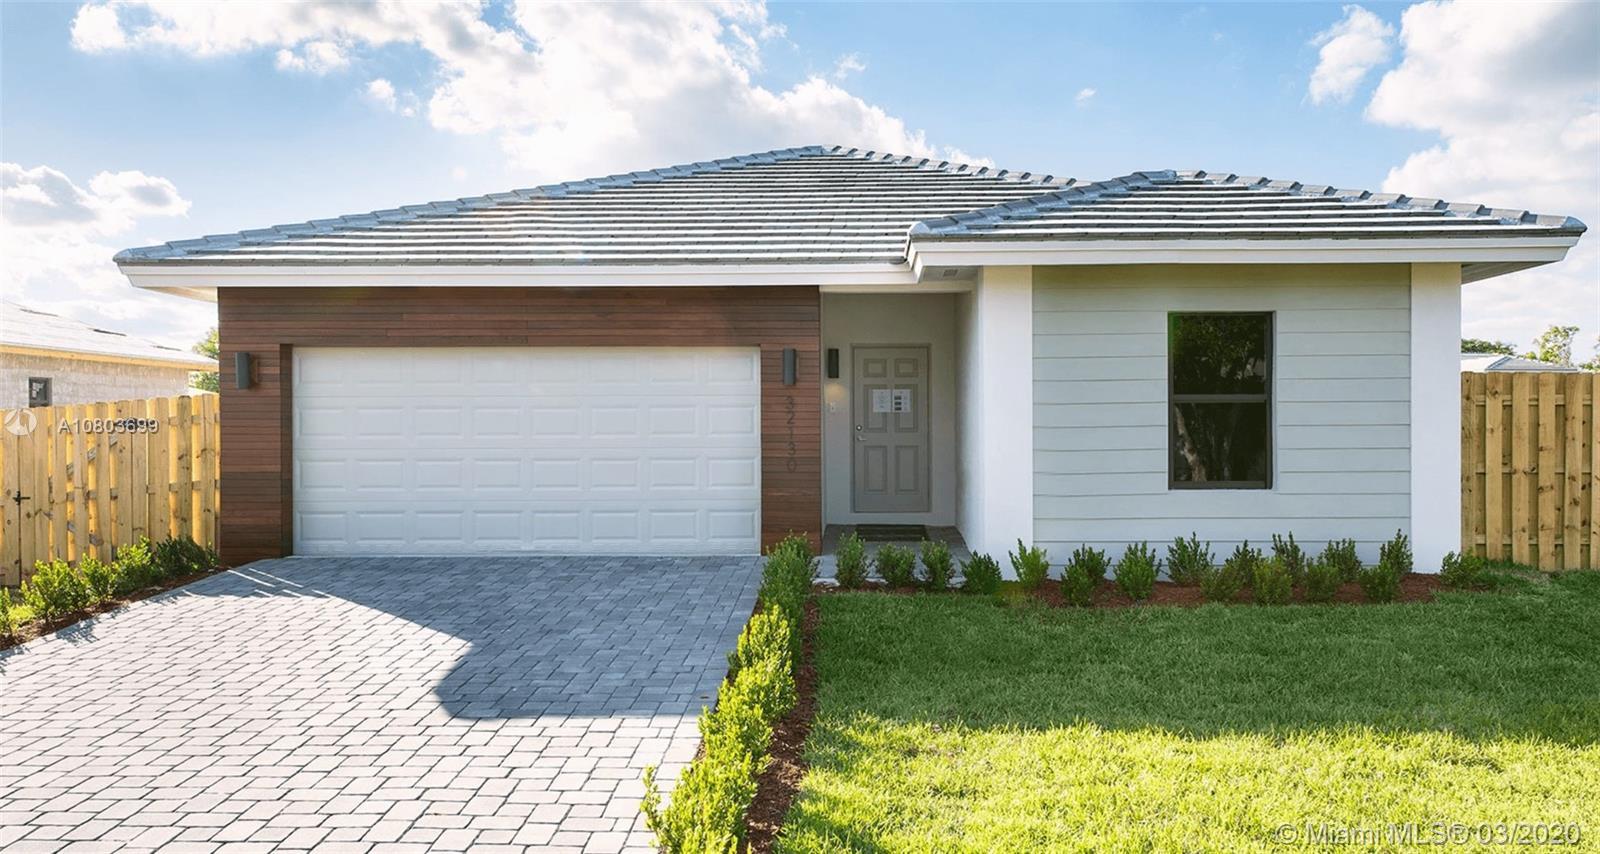 32324 SW 199th Ct, Homestead, FL 33030 - Homestead, FL real estate listing